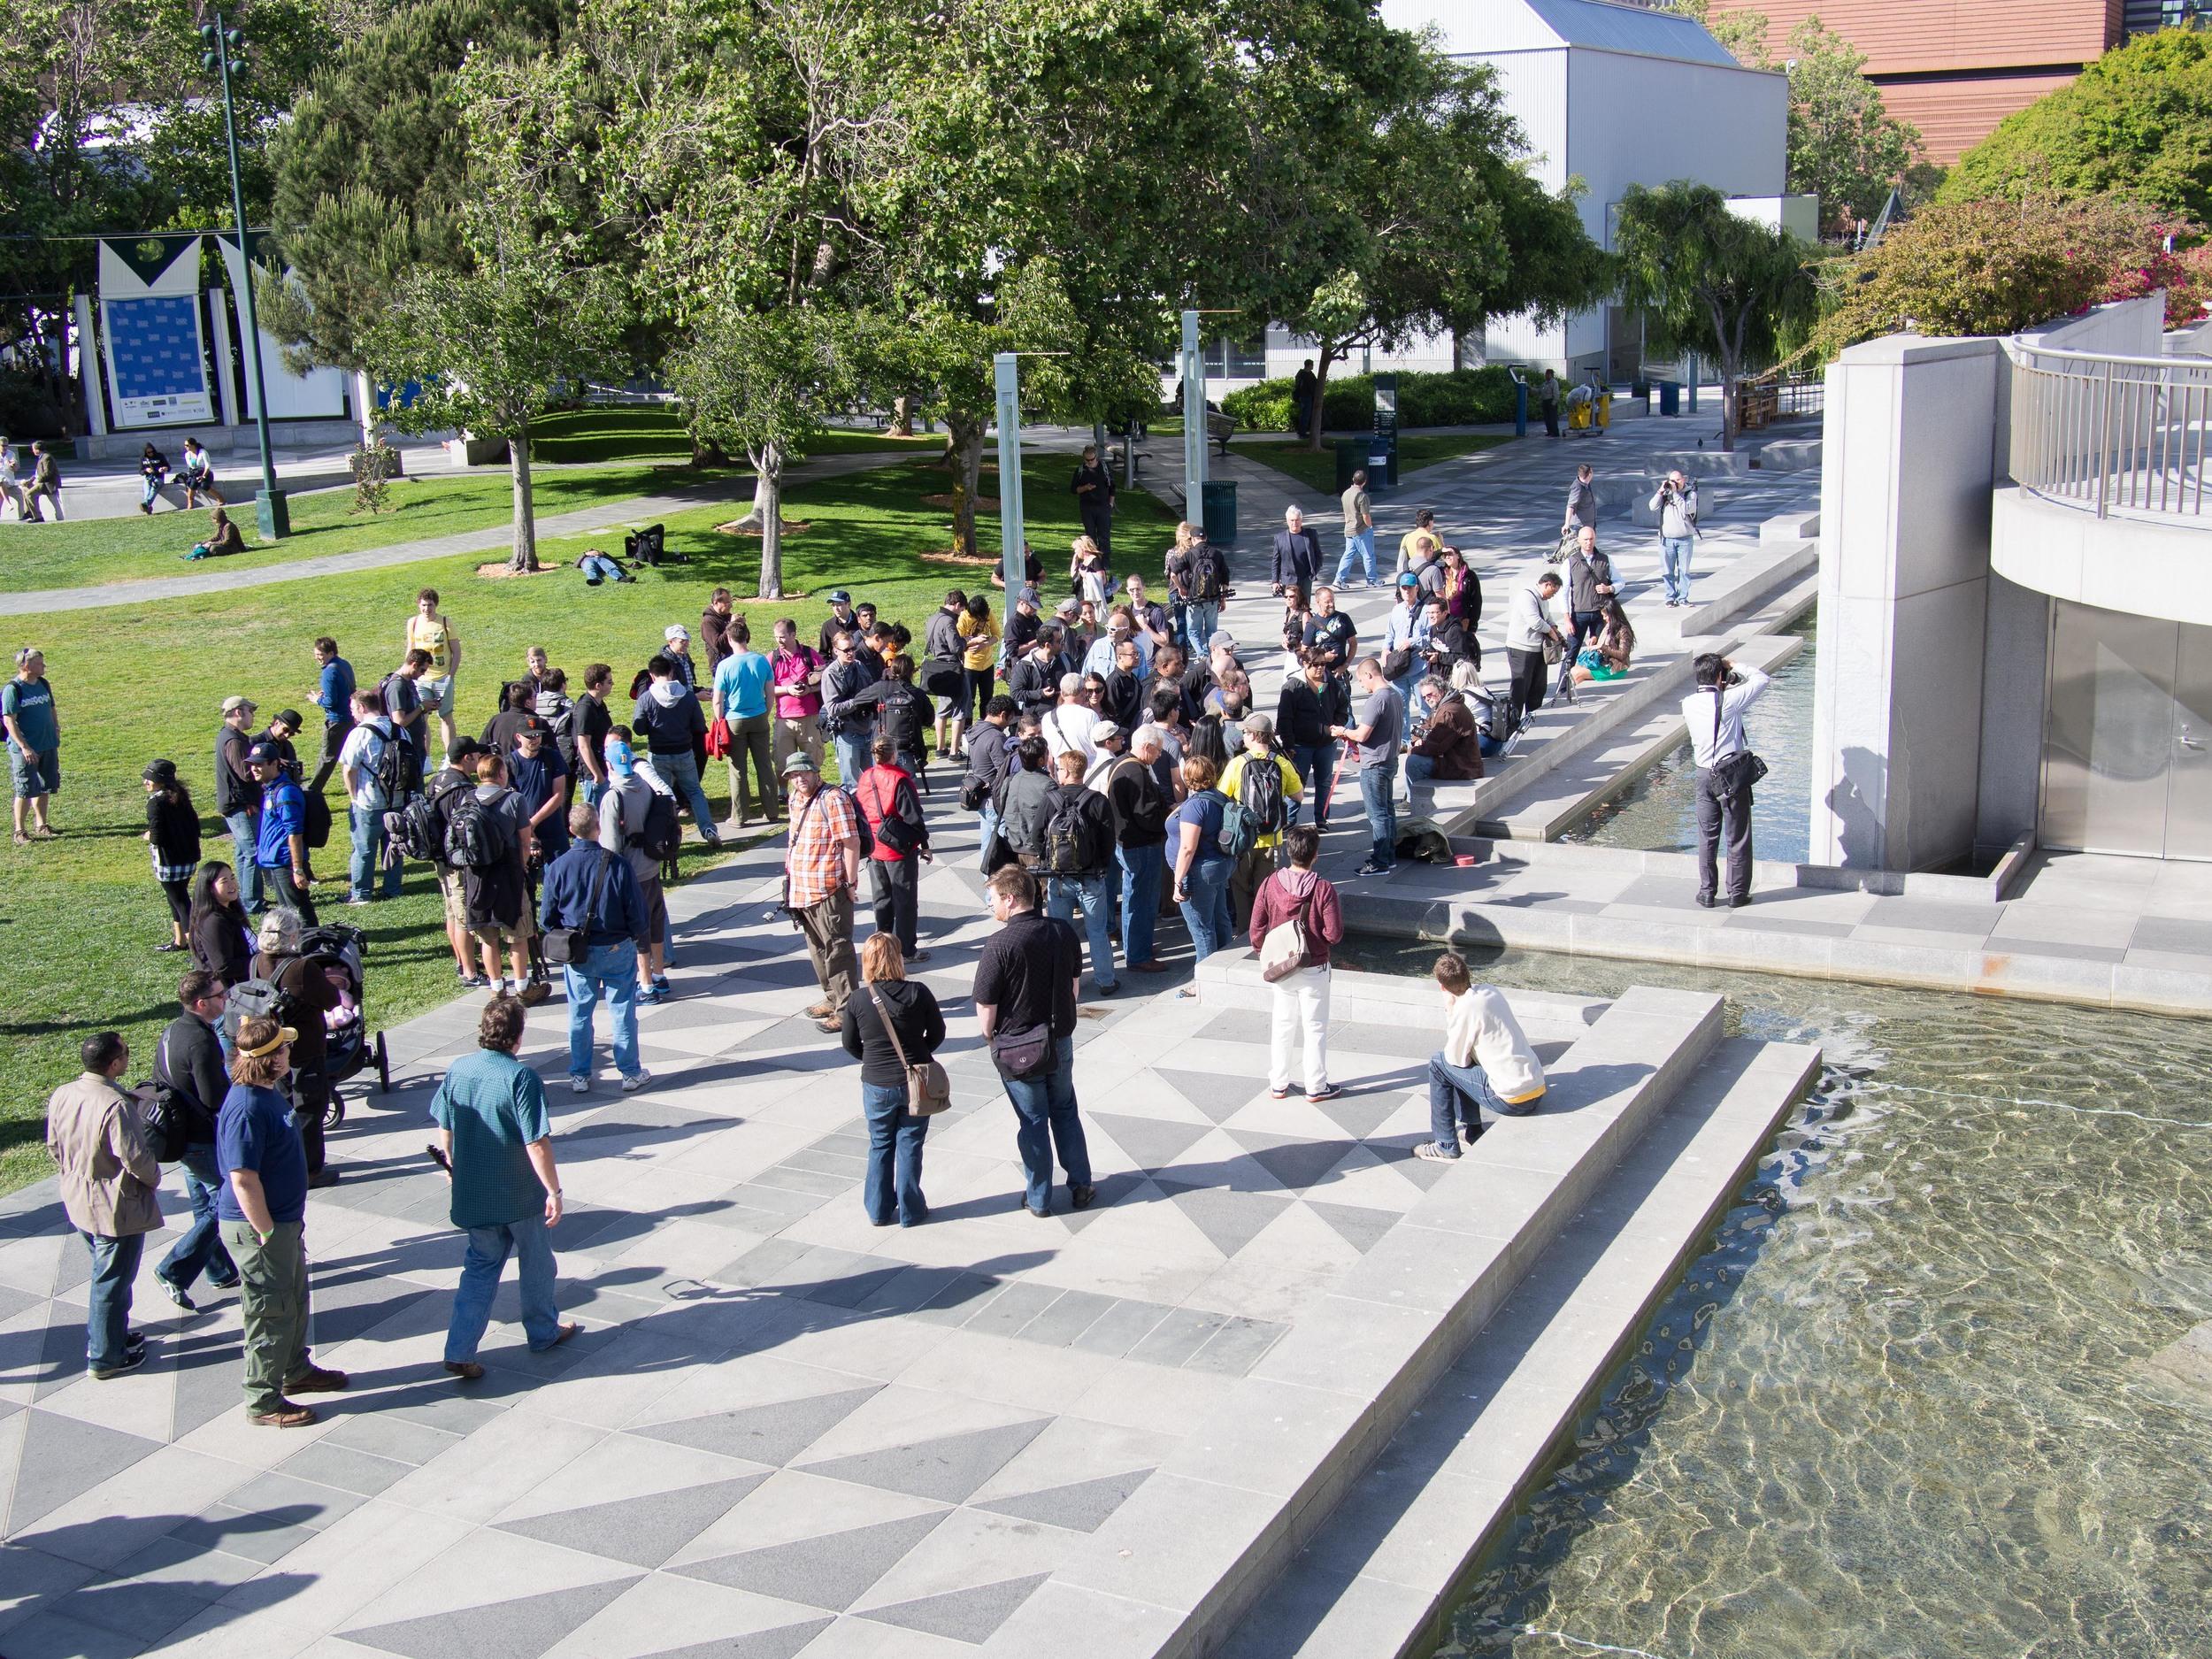 2013 05 14 SF Photowalk with Trey Ratcliff and Thomas Hawk-1 (1 of 12).jpg